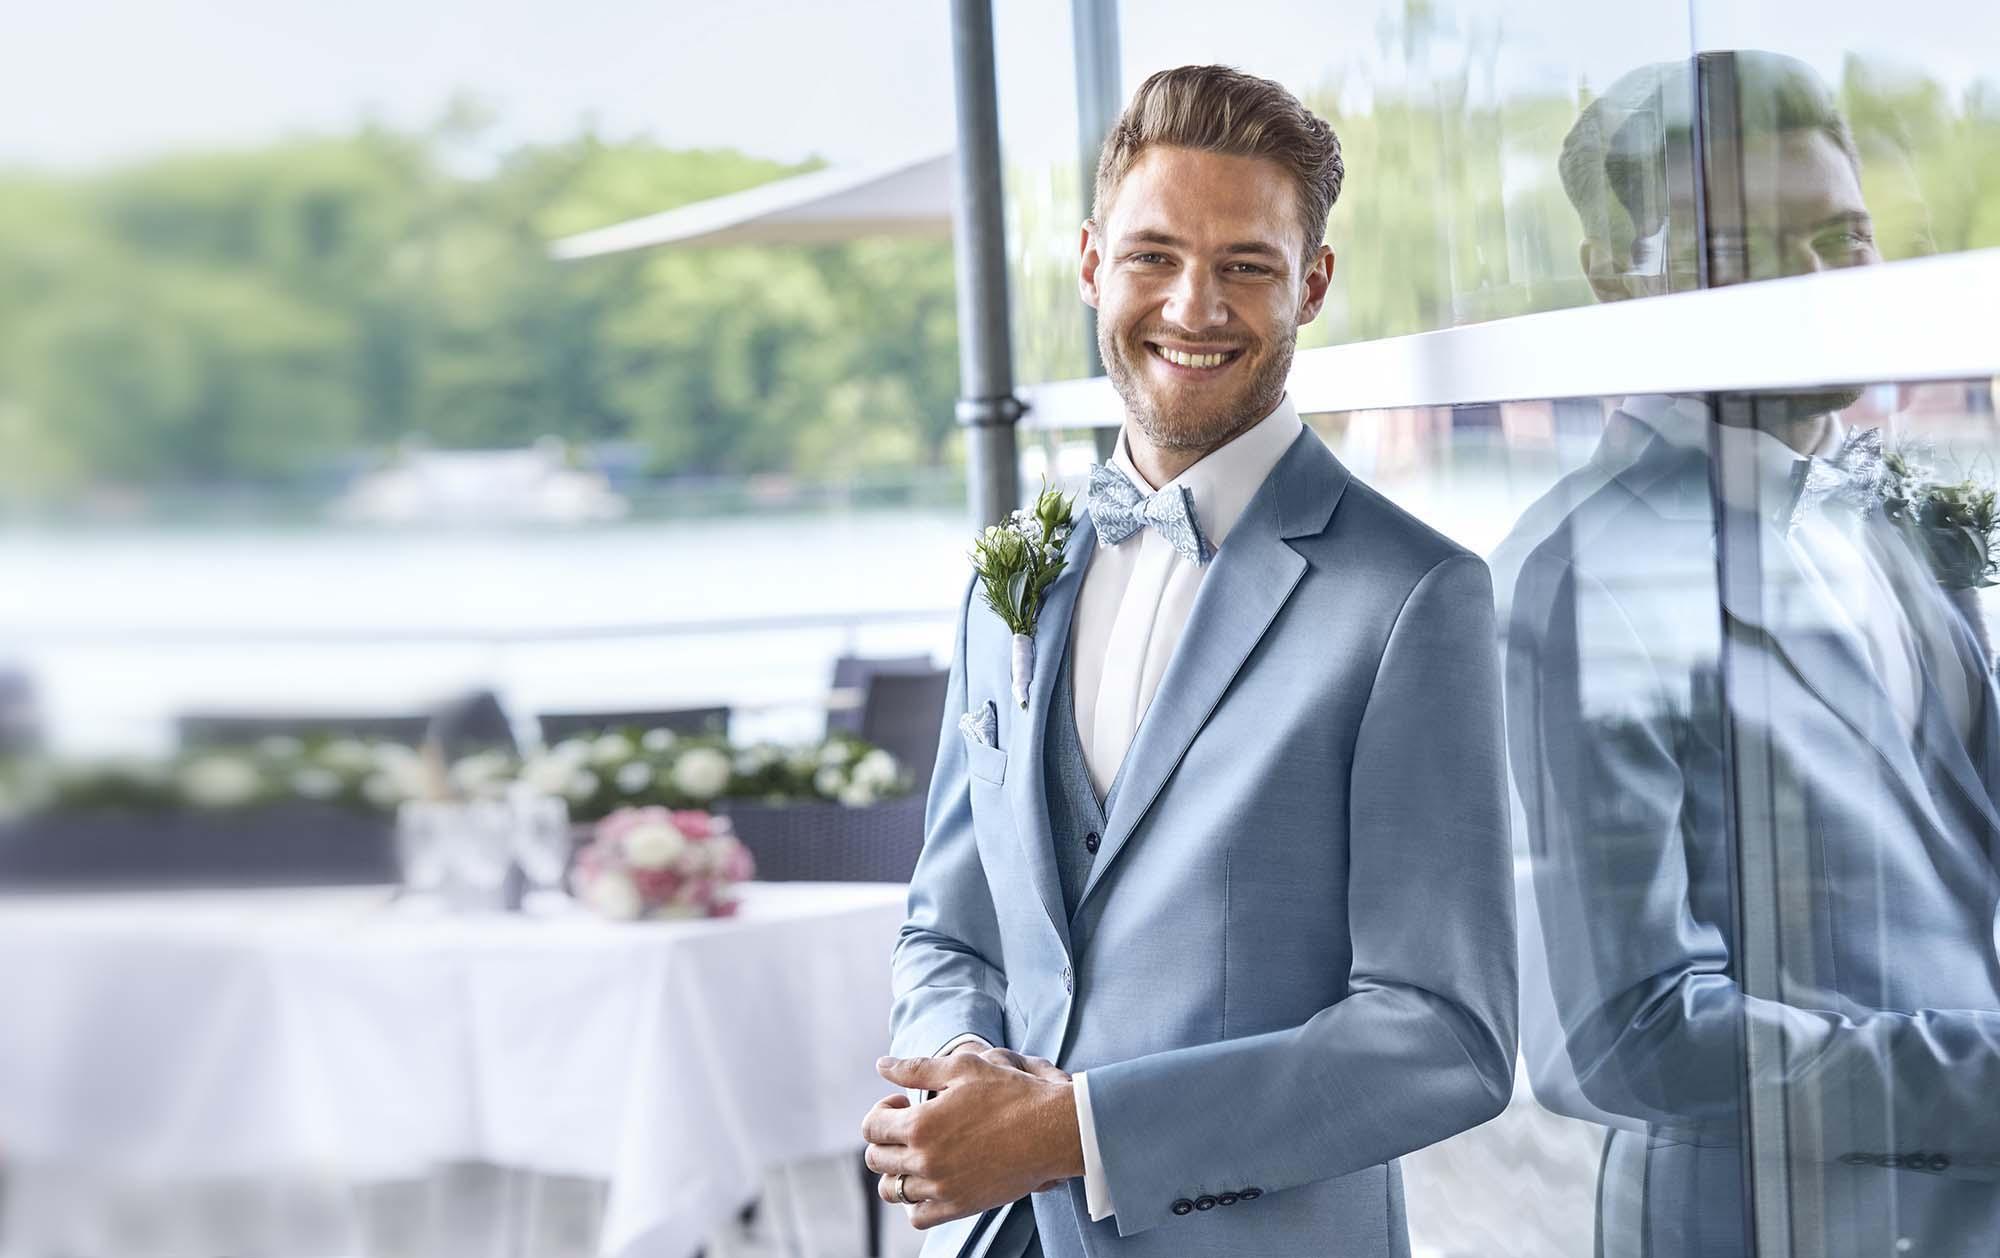 Garzon   Hochzeits-Anzug & Co